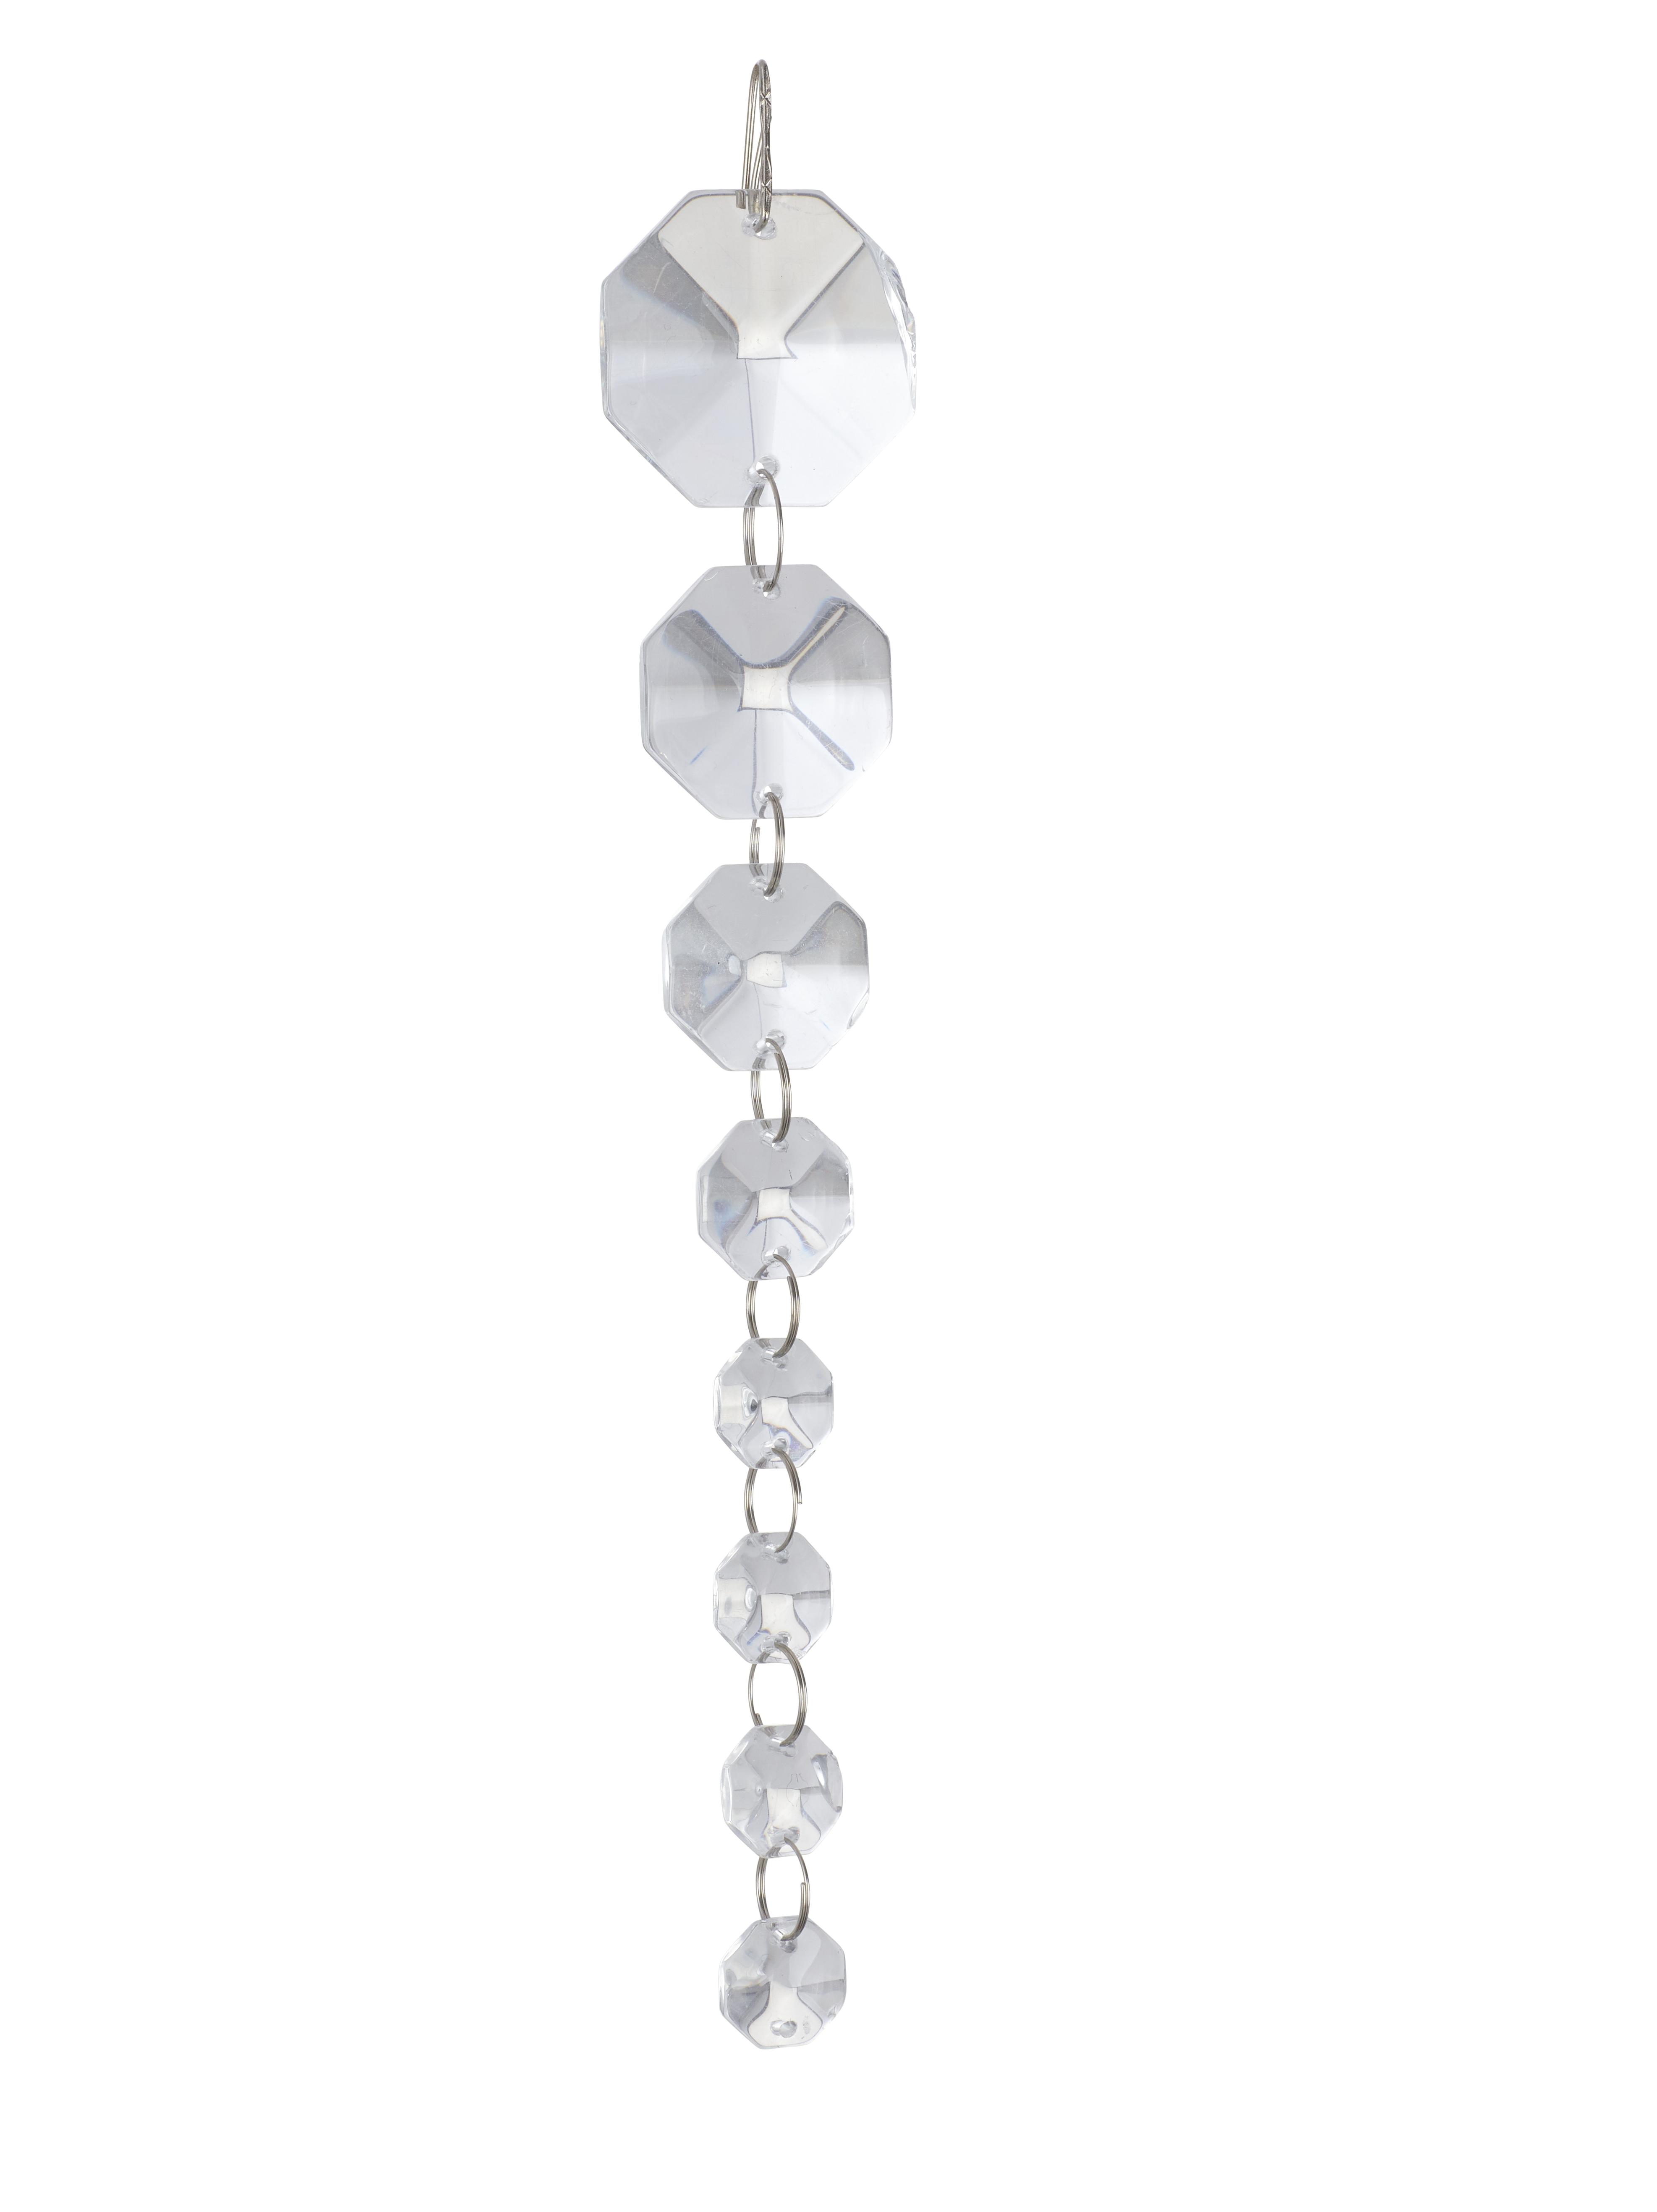 Prisms - Lower Lenght Gränsö 104890